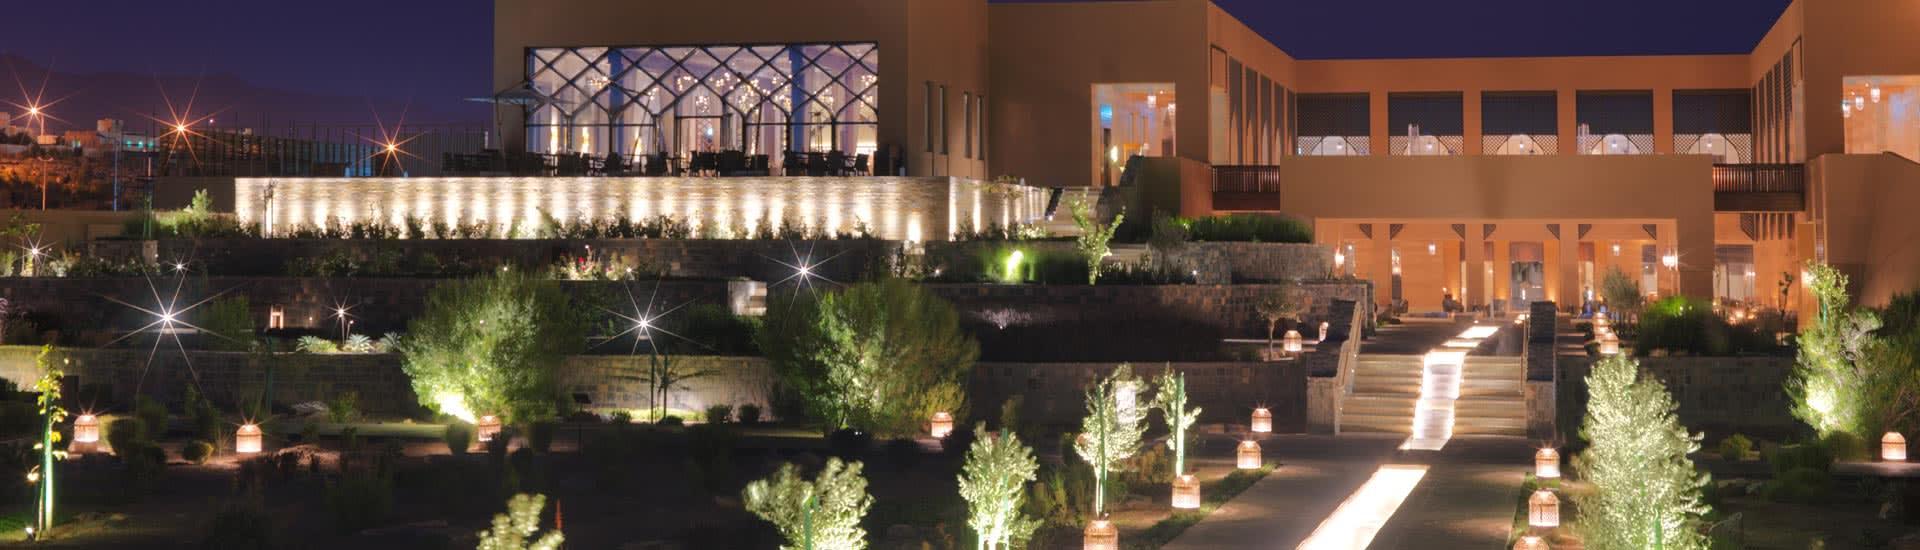 Exterior View of Al Maisan Oman Restaurant